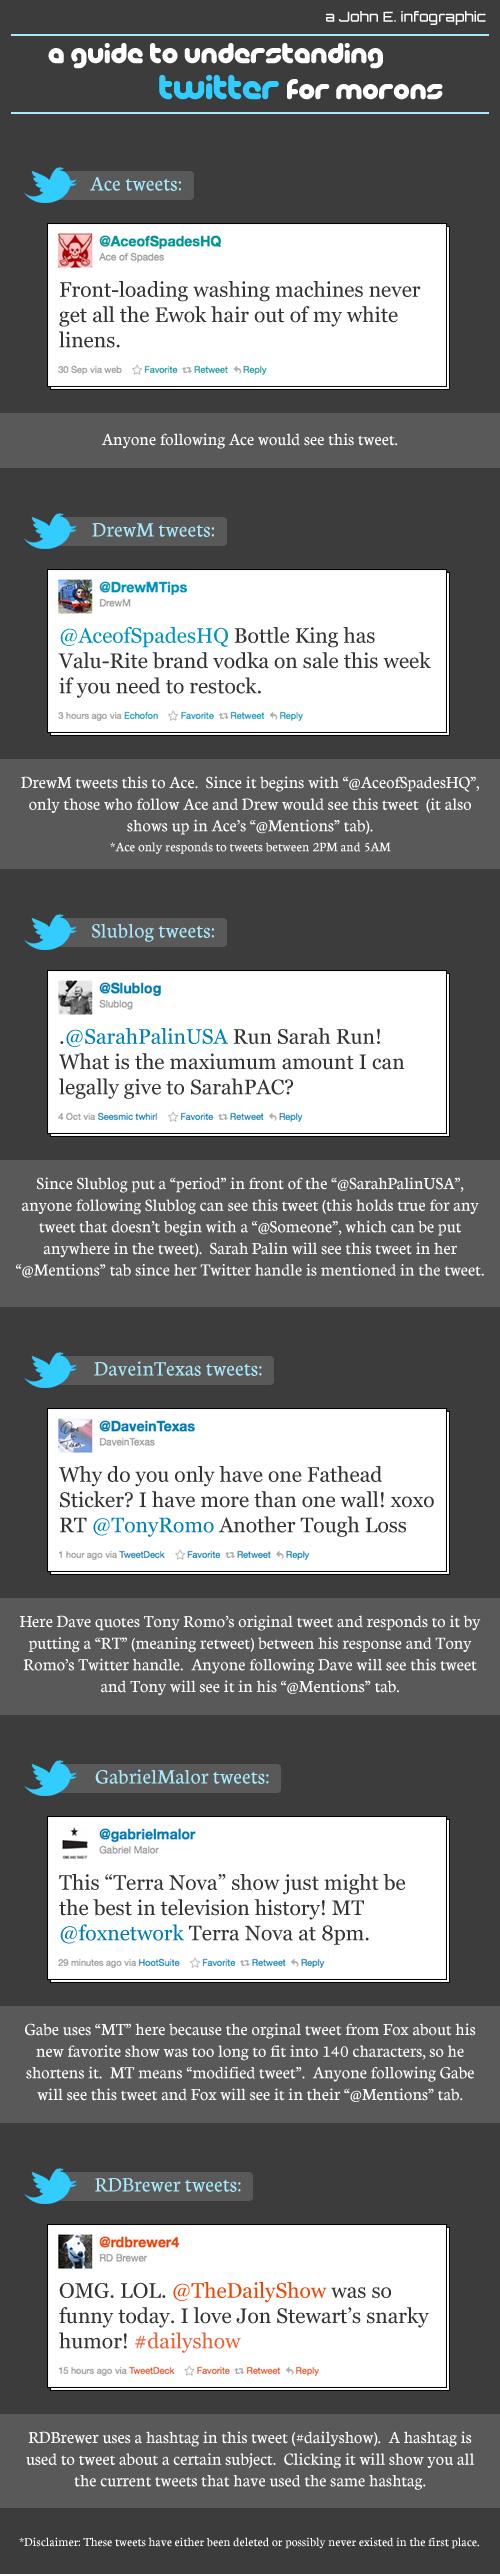 Understanding Twitter for Morons